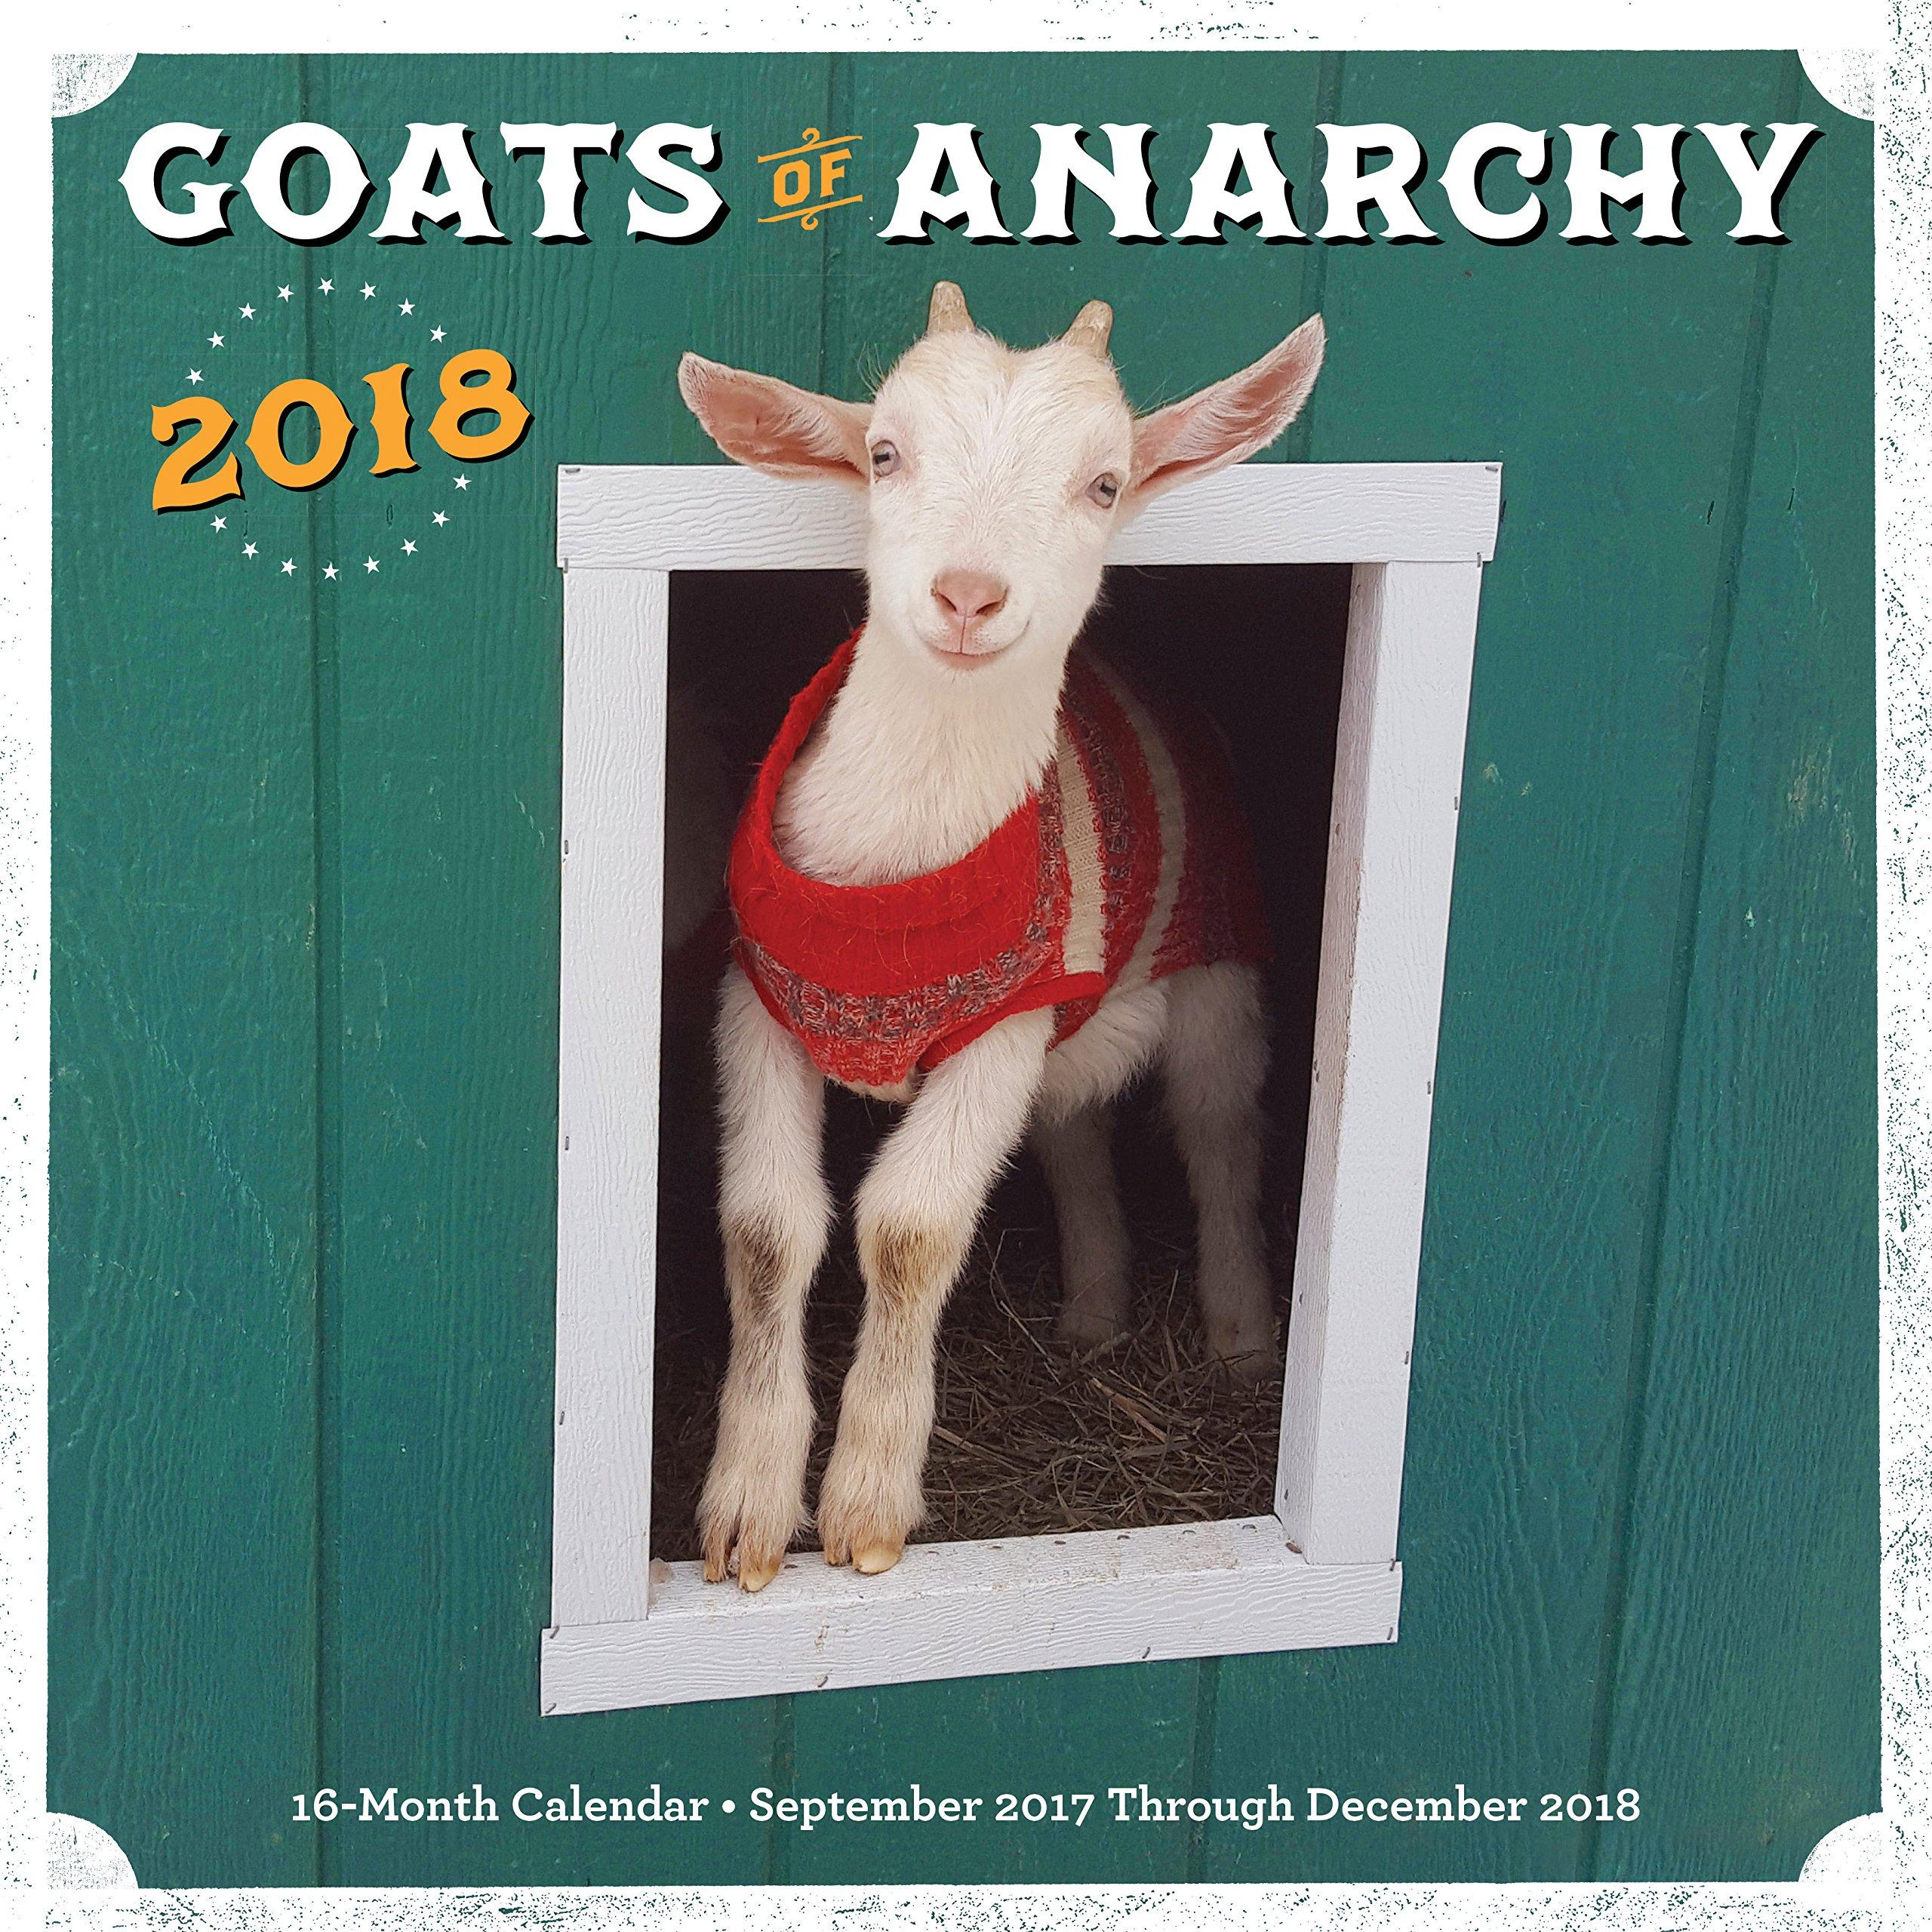 Sluh Calendar.Goats Of Anarchy 2018 16 Month Calendar Includes September 2017